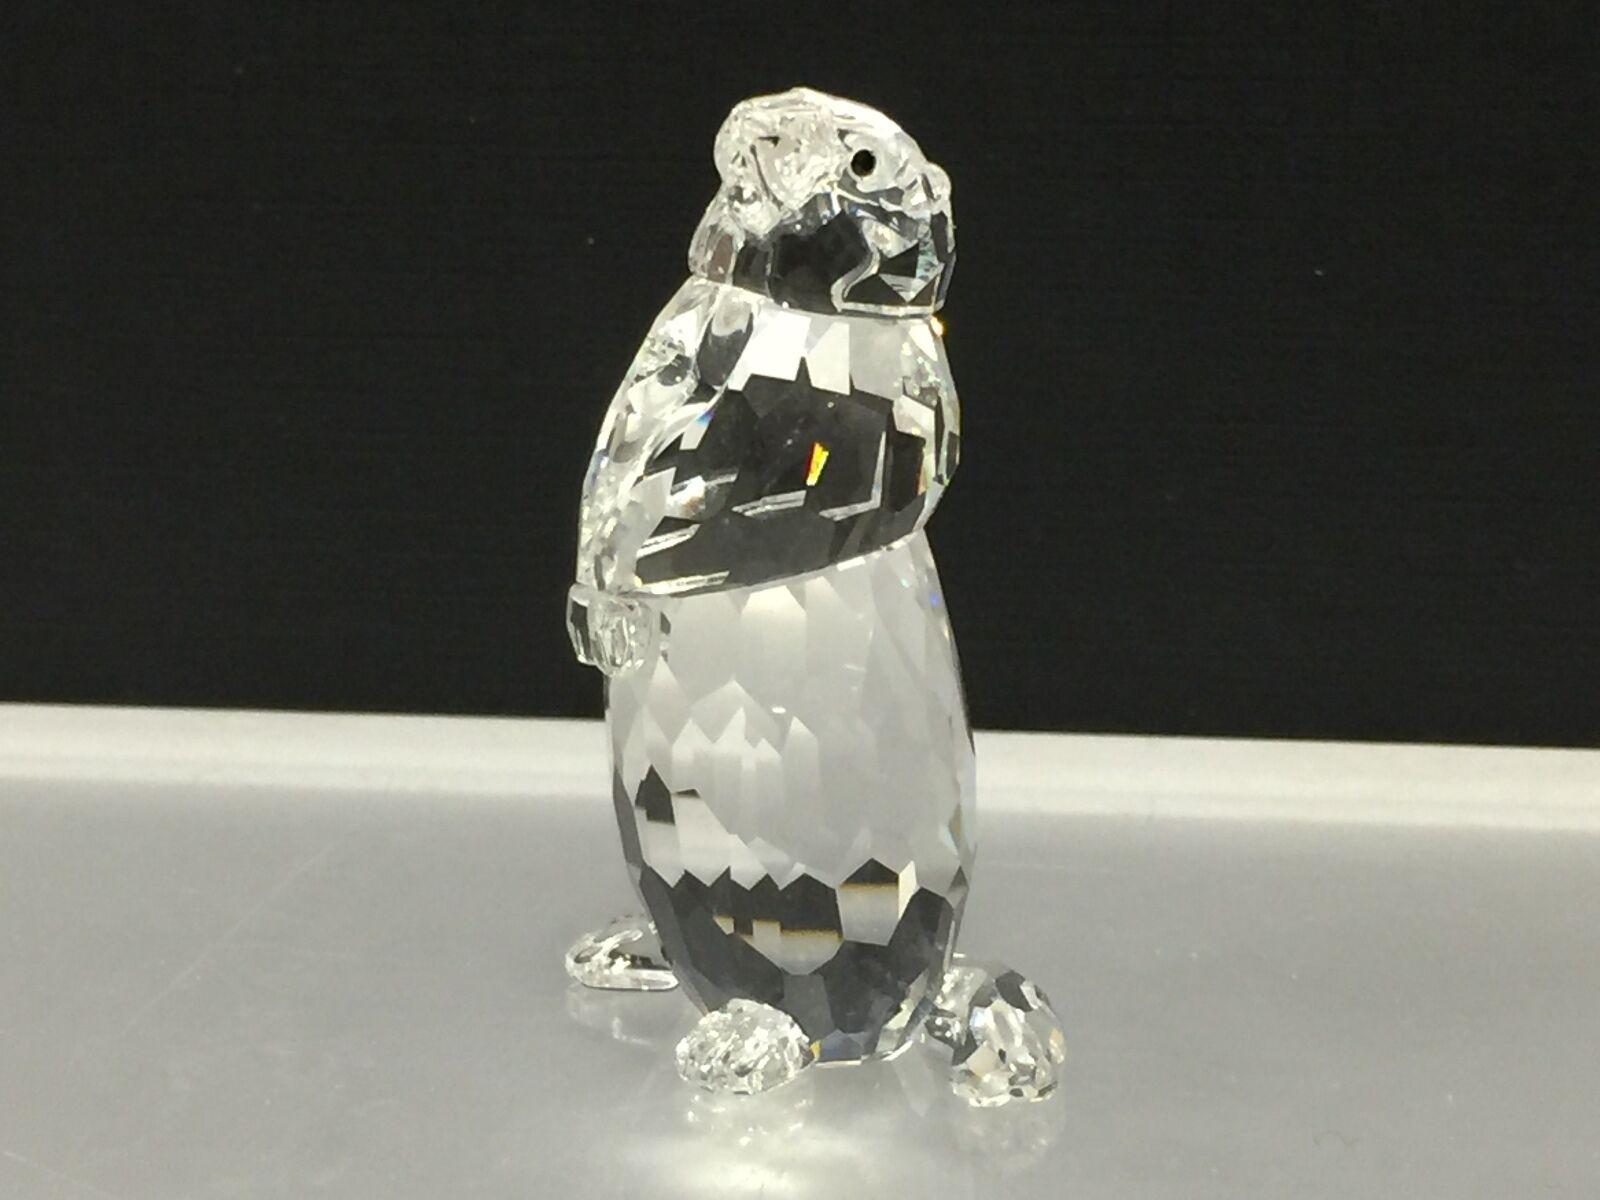 SWAROVSKI Figura marmotta 4,7 cm (((ottimo stato)))